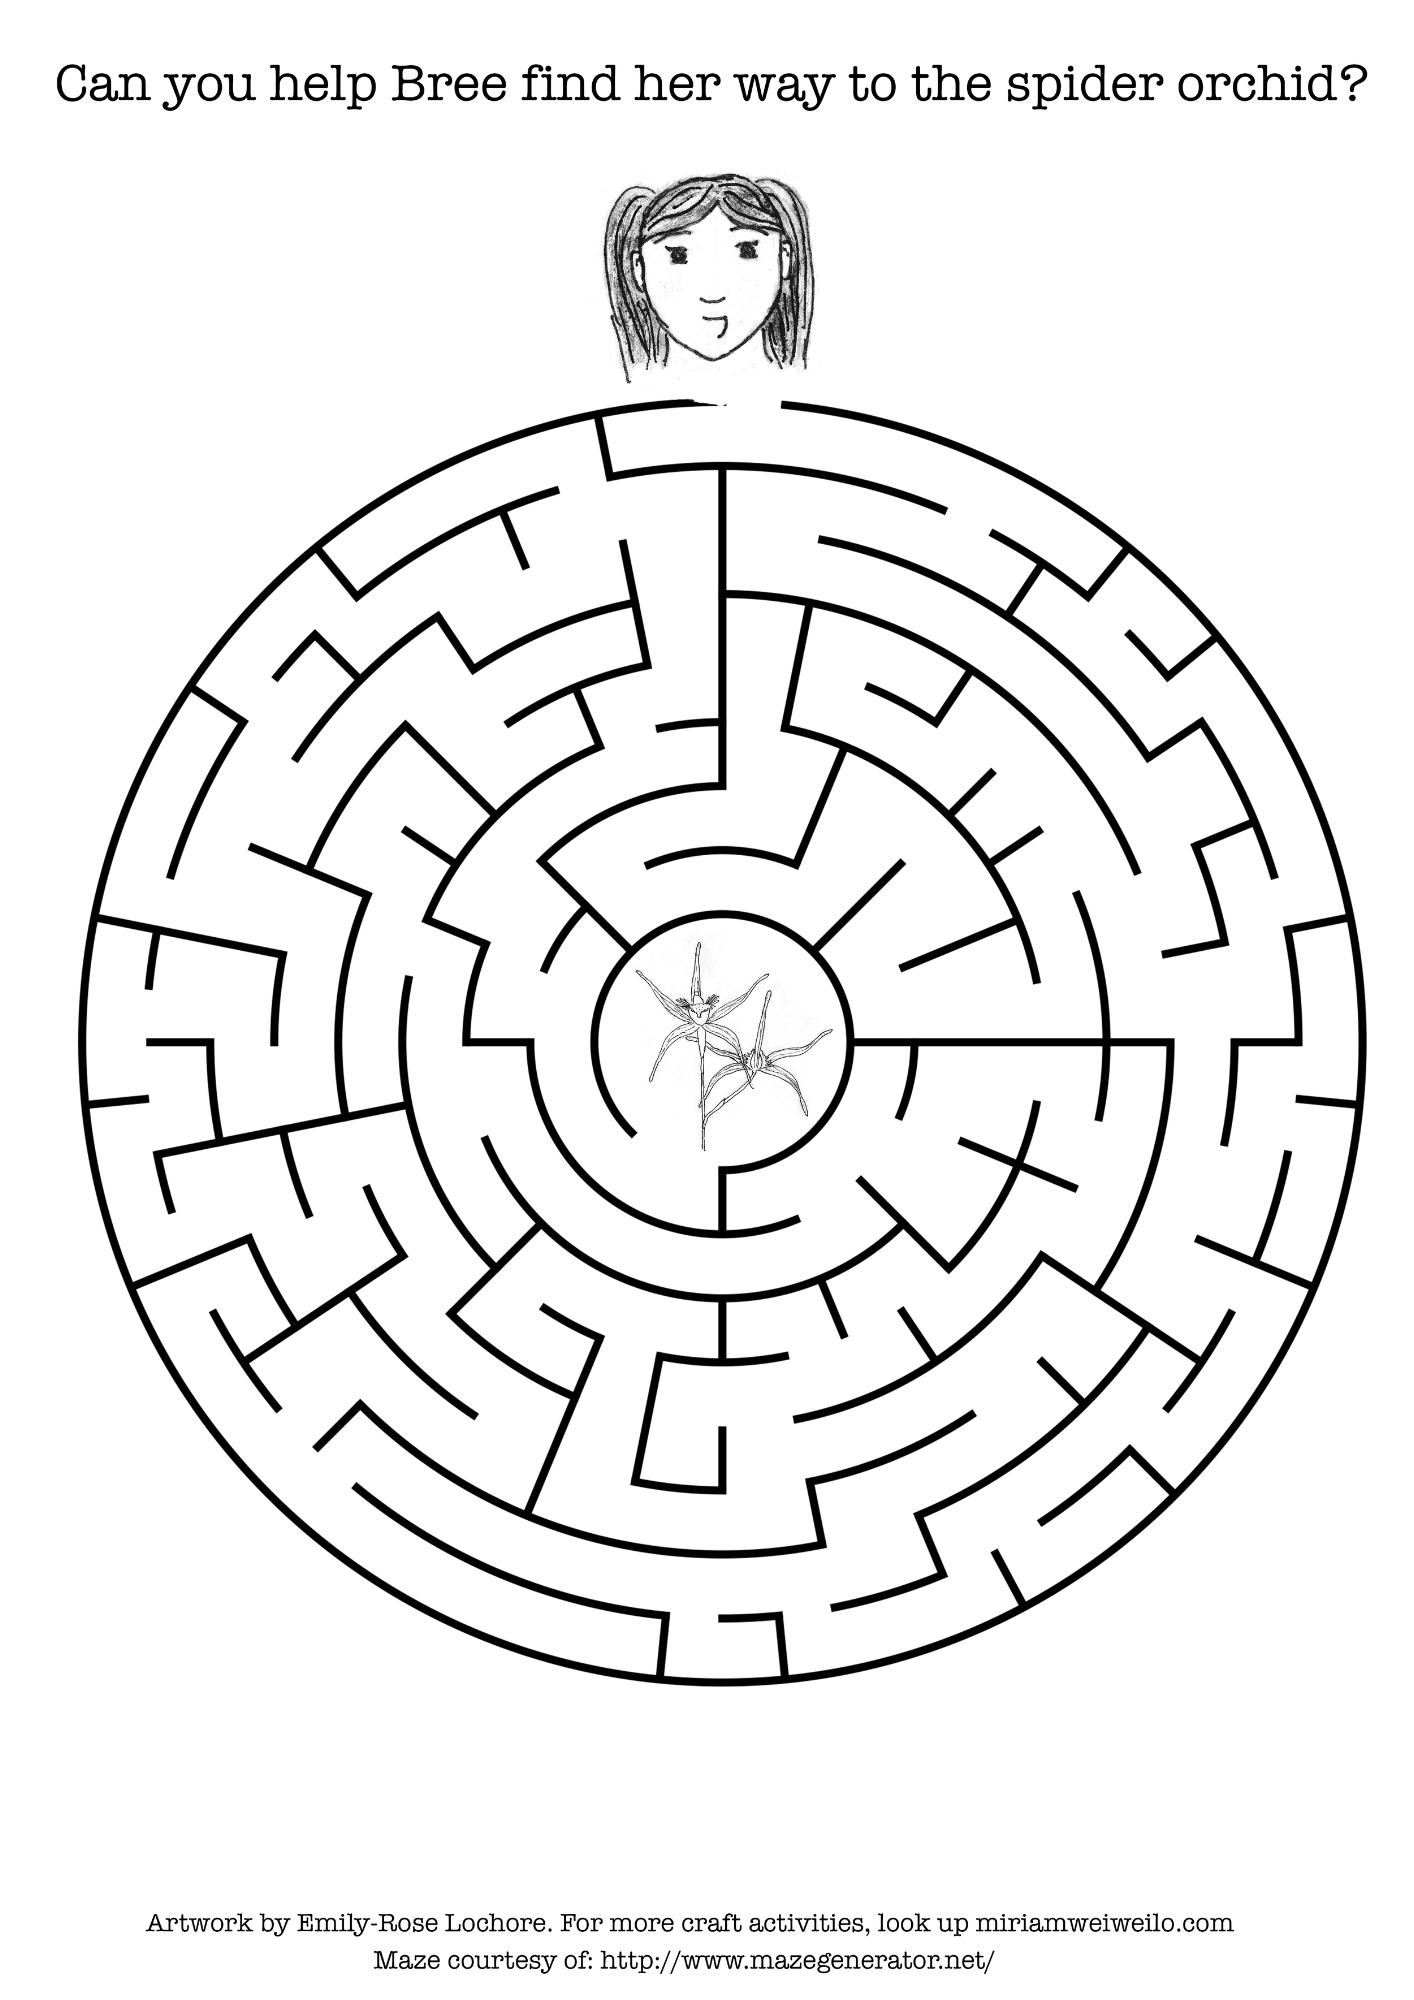 bfa-maze-craft-flattened.png